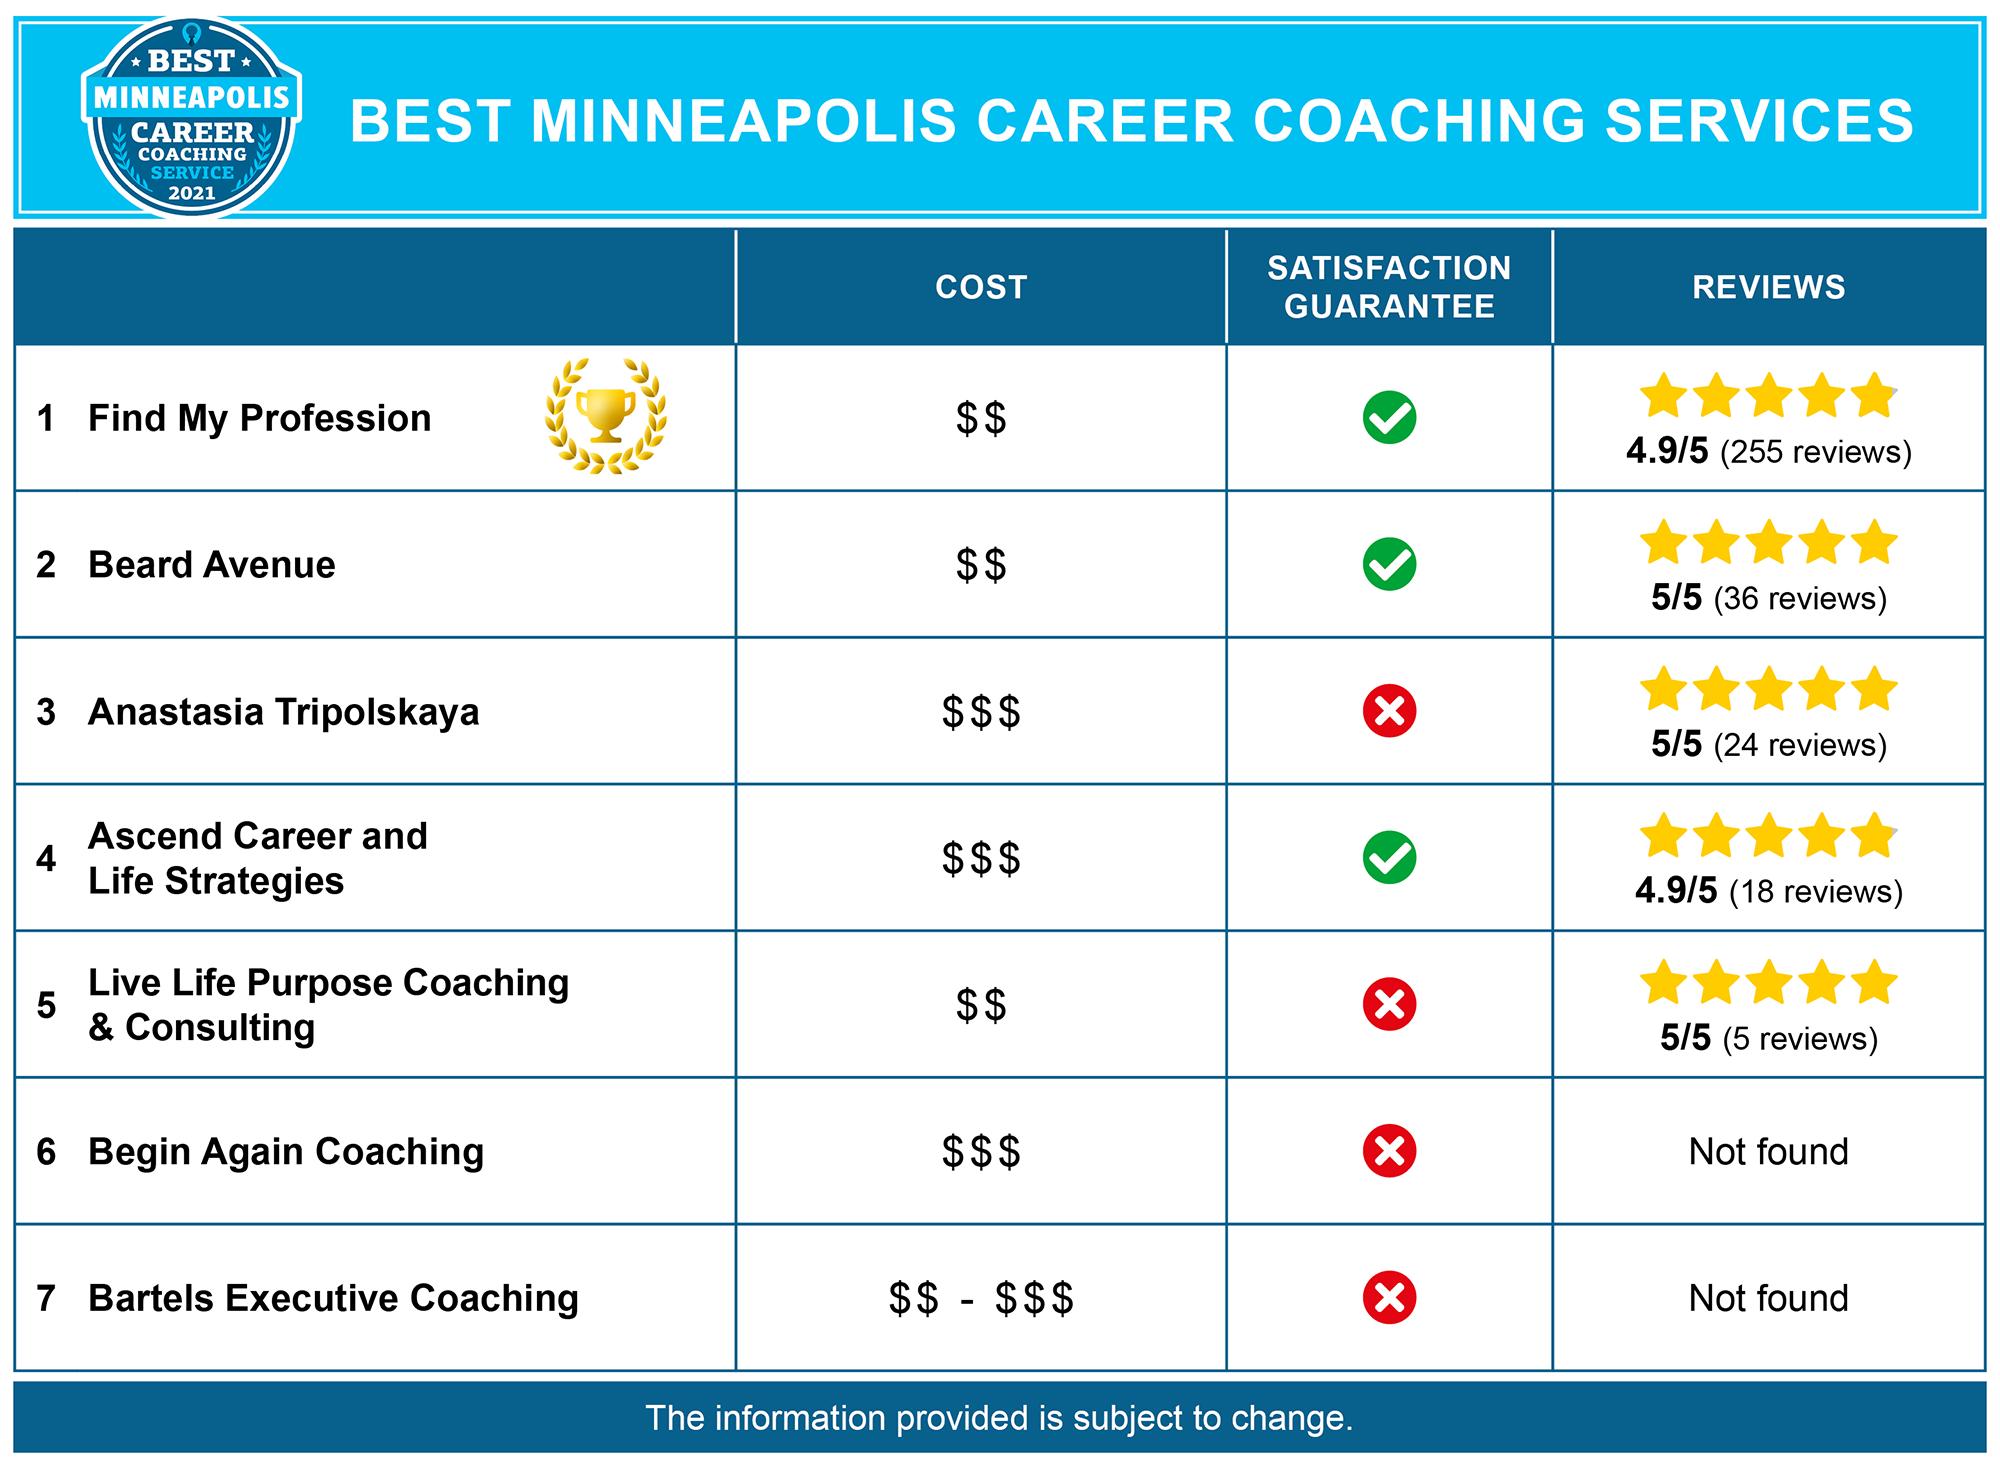 Best Minneapolis Career Coaches